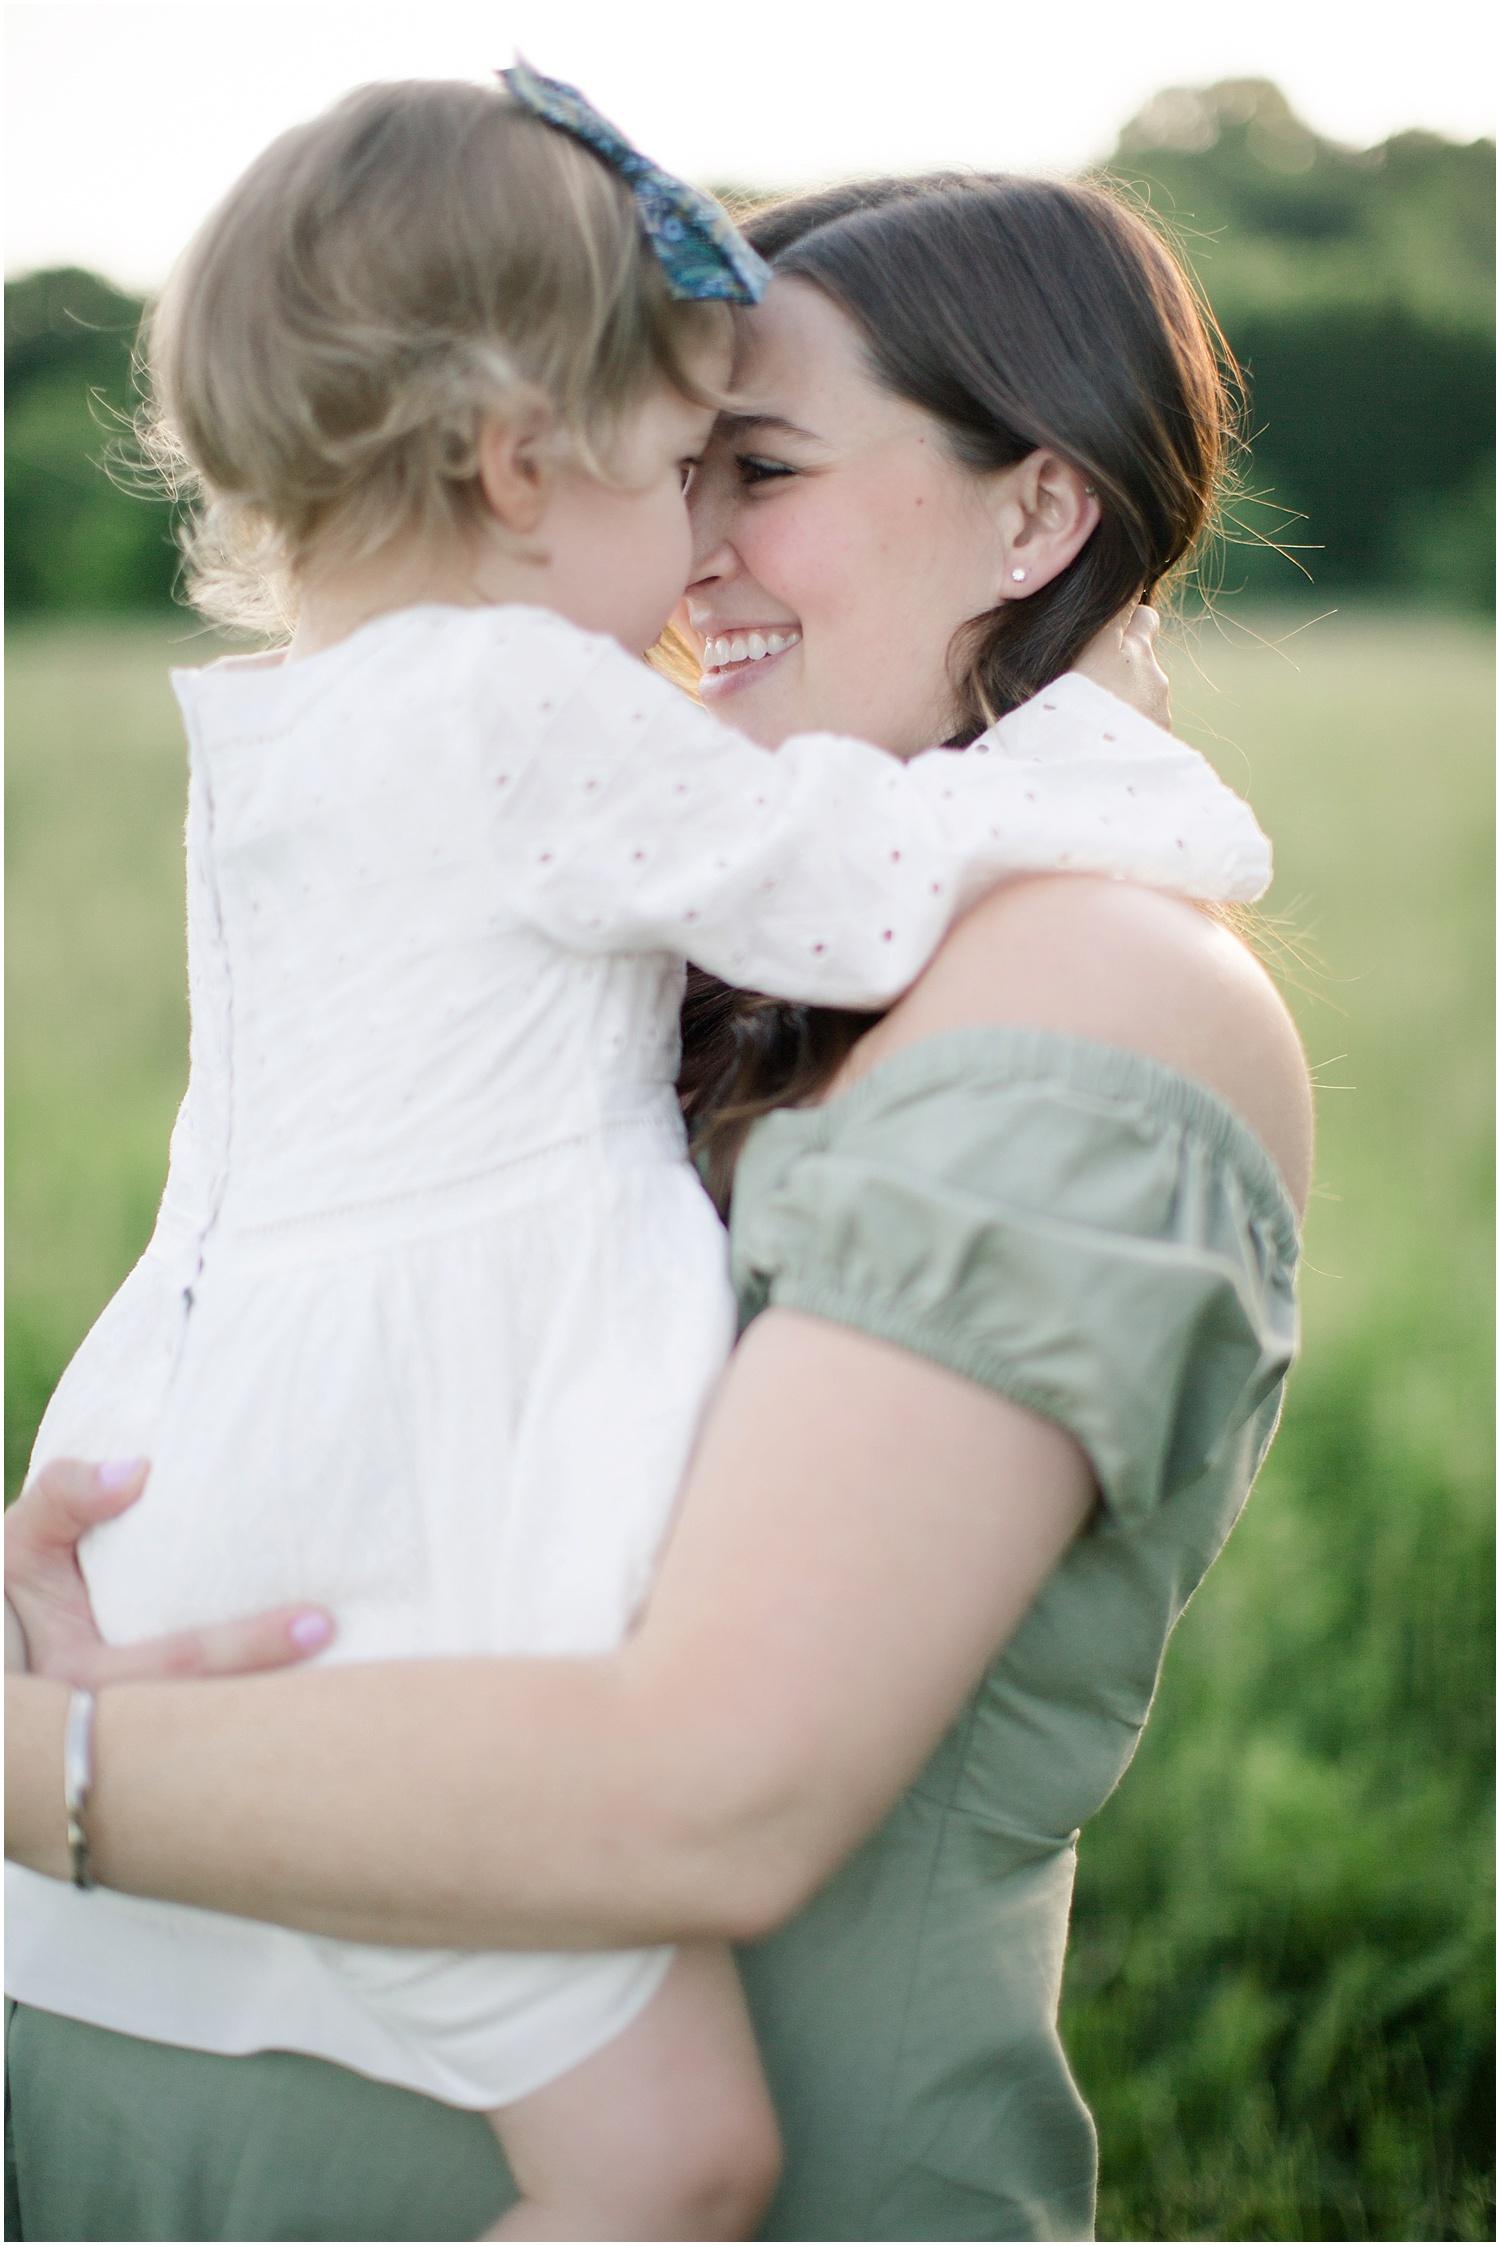 astleigh hill maternity session_0009.jpg